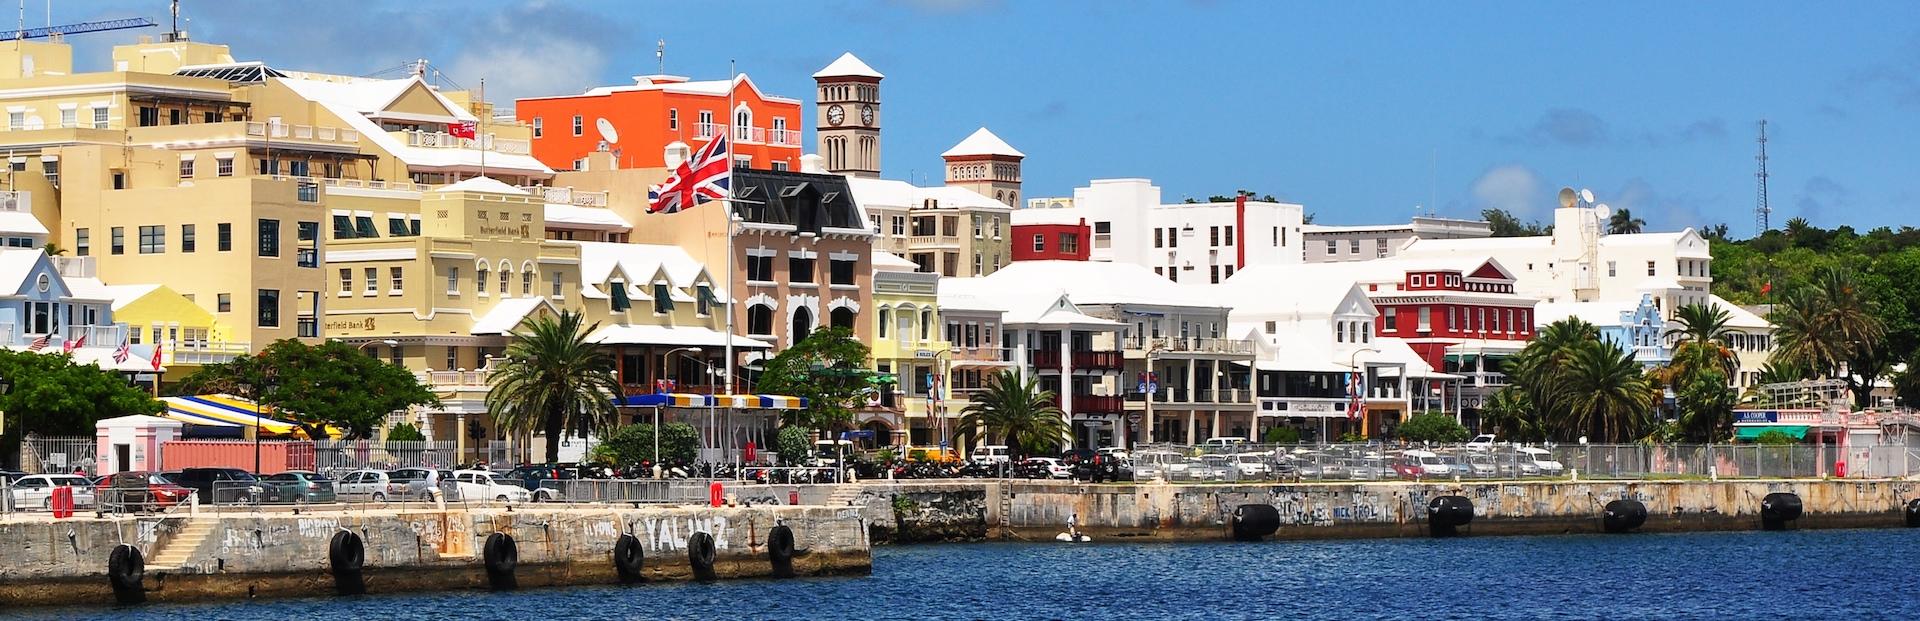 Hamilton audio tour: Look Both Ways: A journey through the lives of Bermuda's LGBT+allies